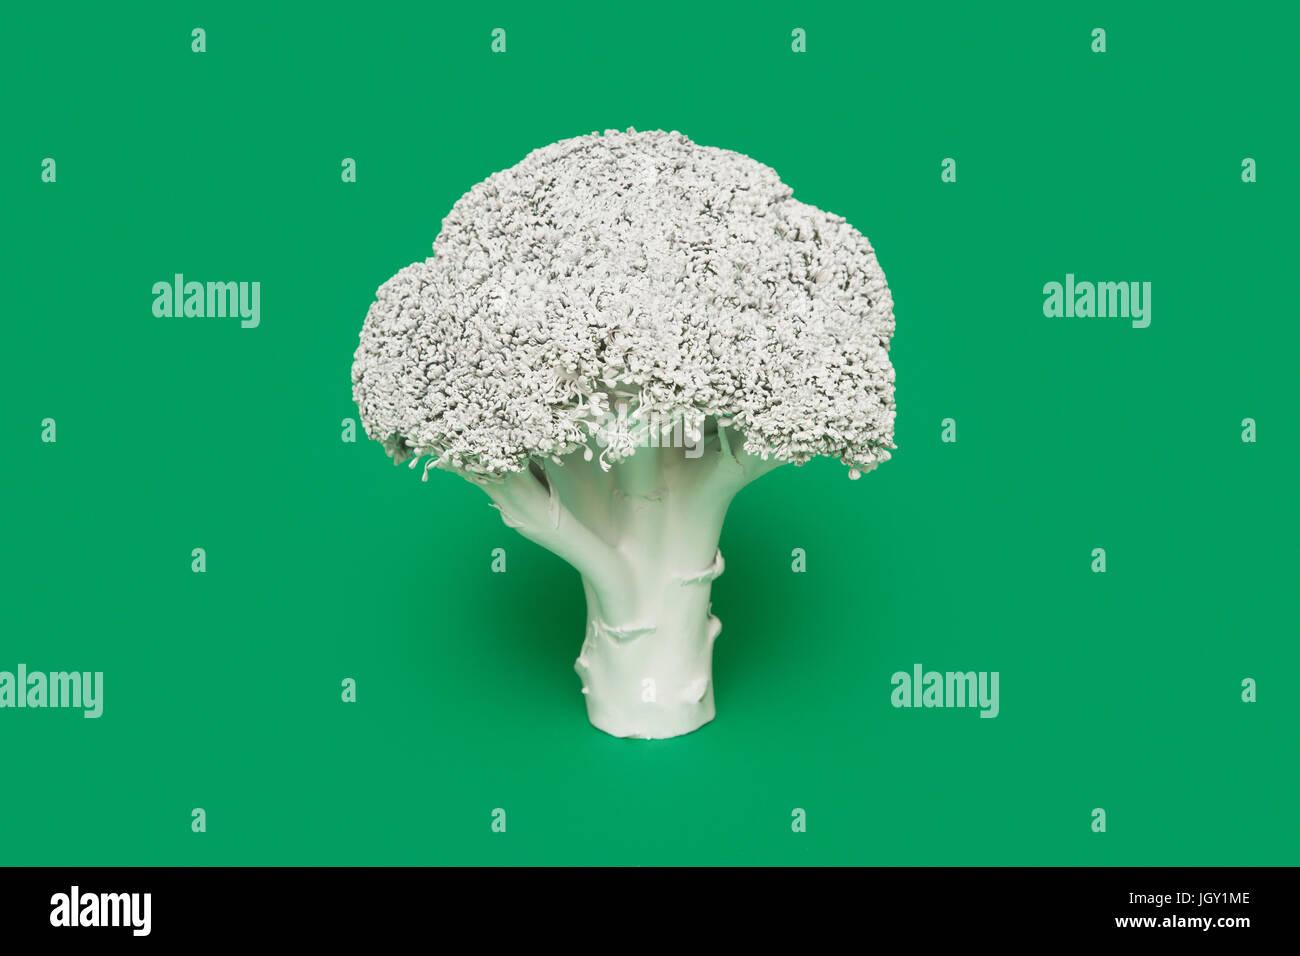 Brócoli pintado de blanco sobre fondo verde Imagen De Stock